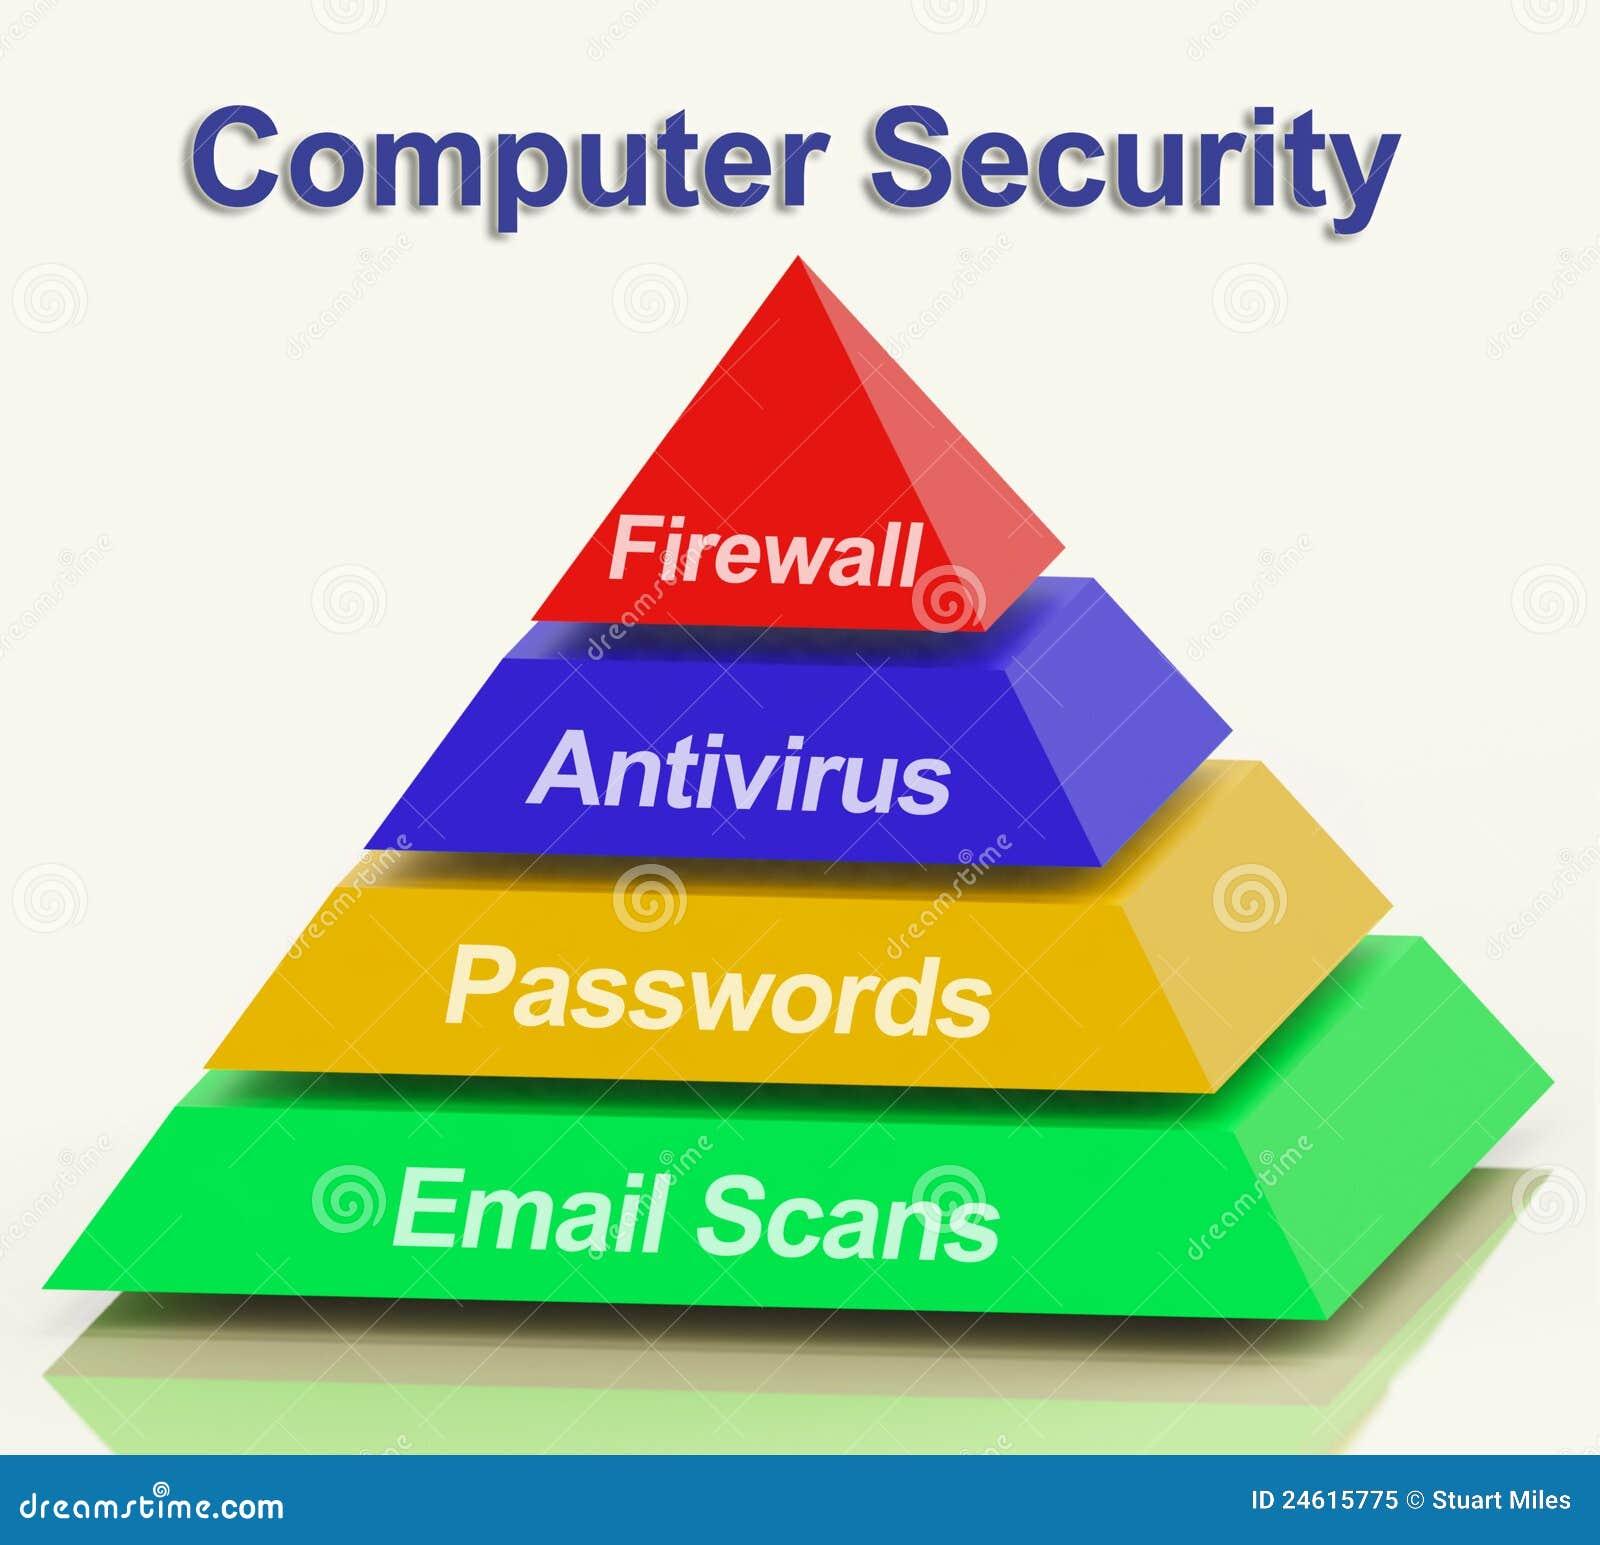 Computer Pyramid Diagram Shows Laptop Internet Safety